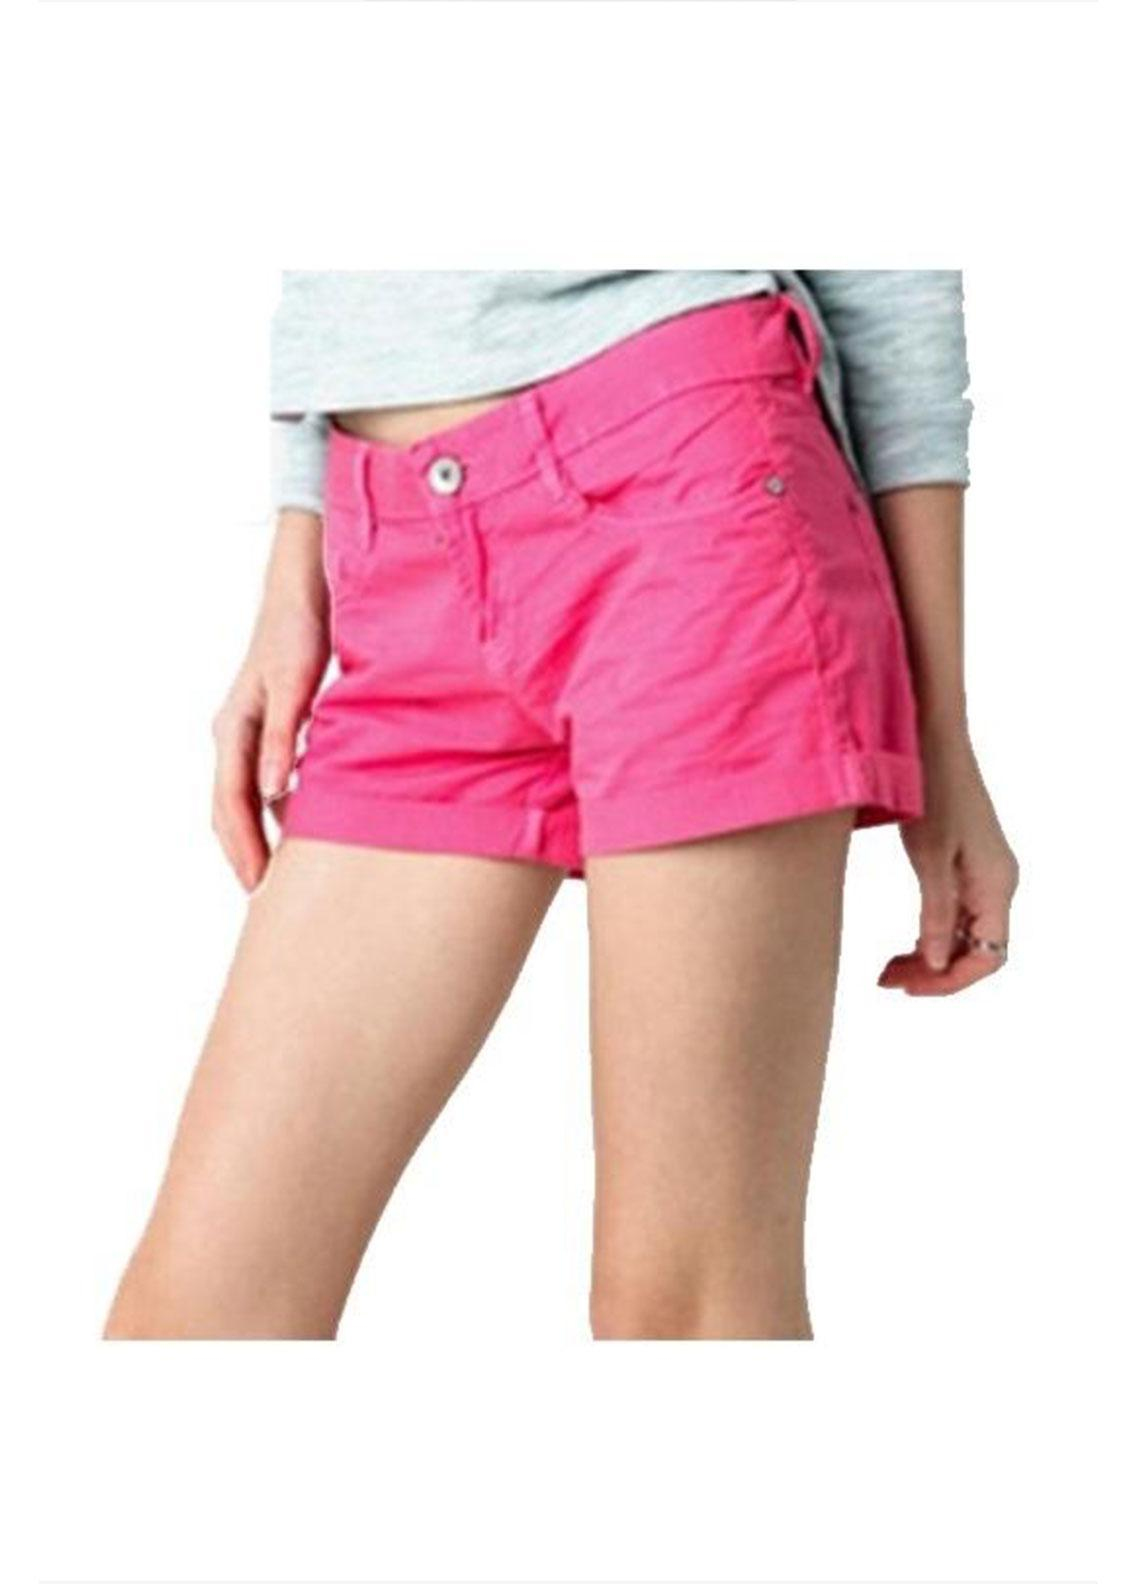 Ignite Wardrobe Stretchable Cotton Shorts IG20HPW 005